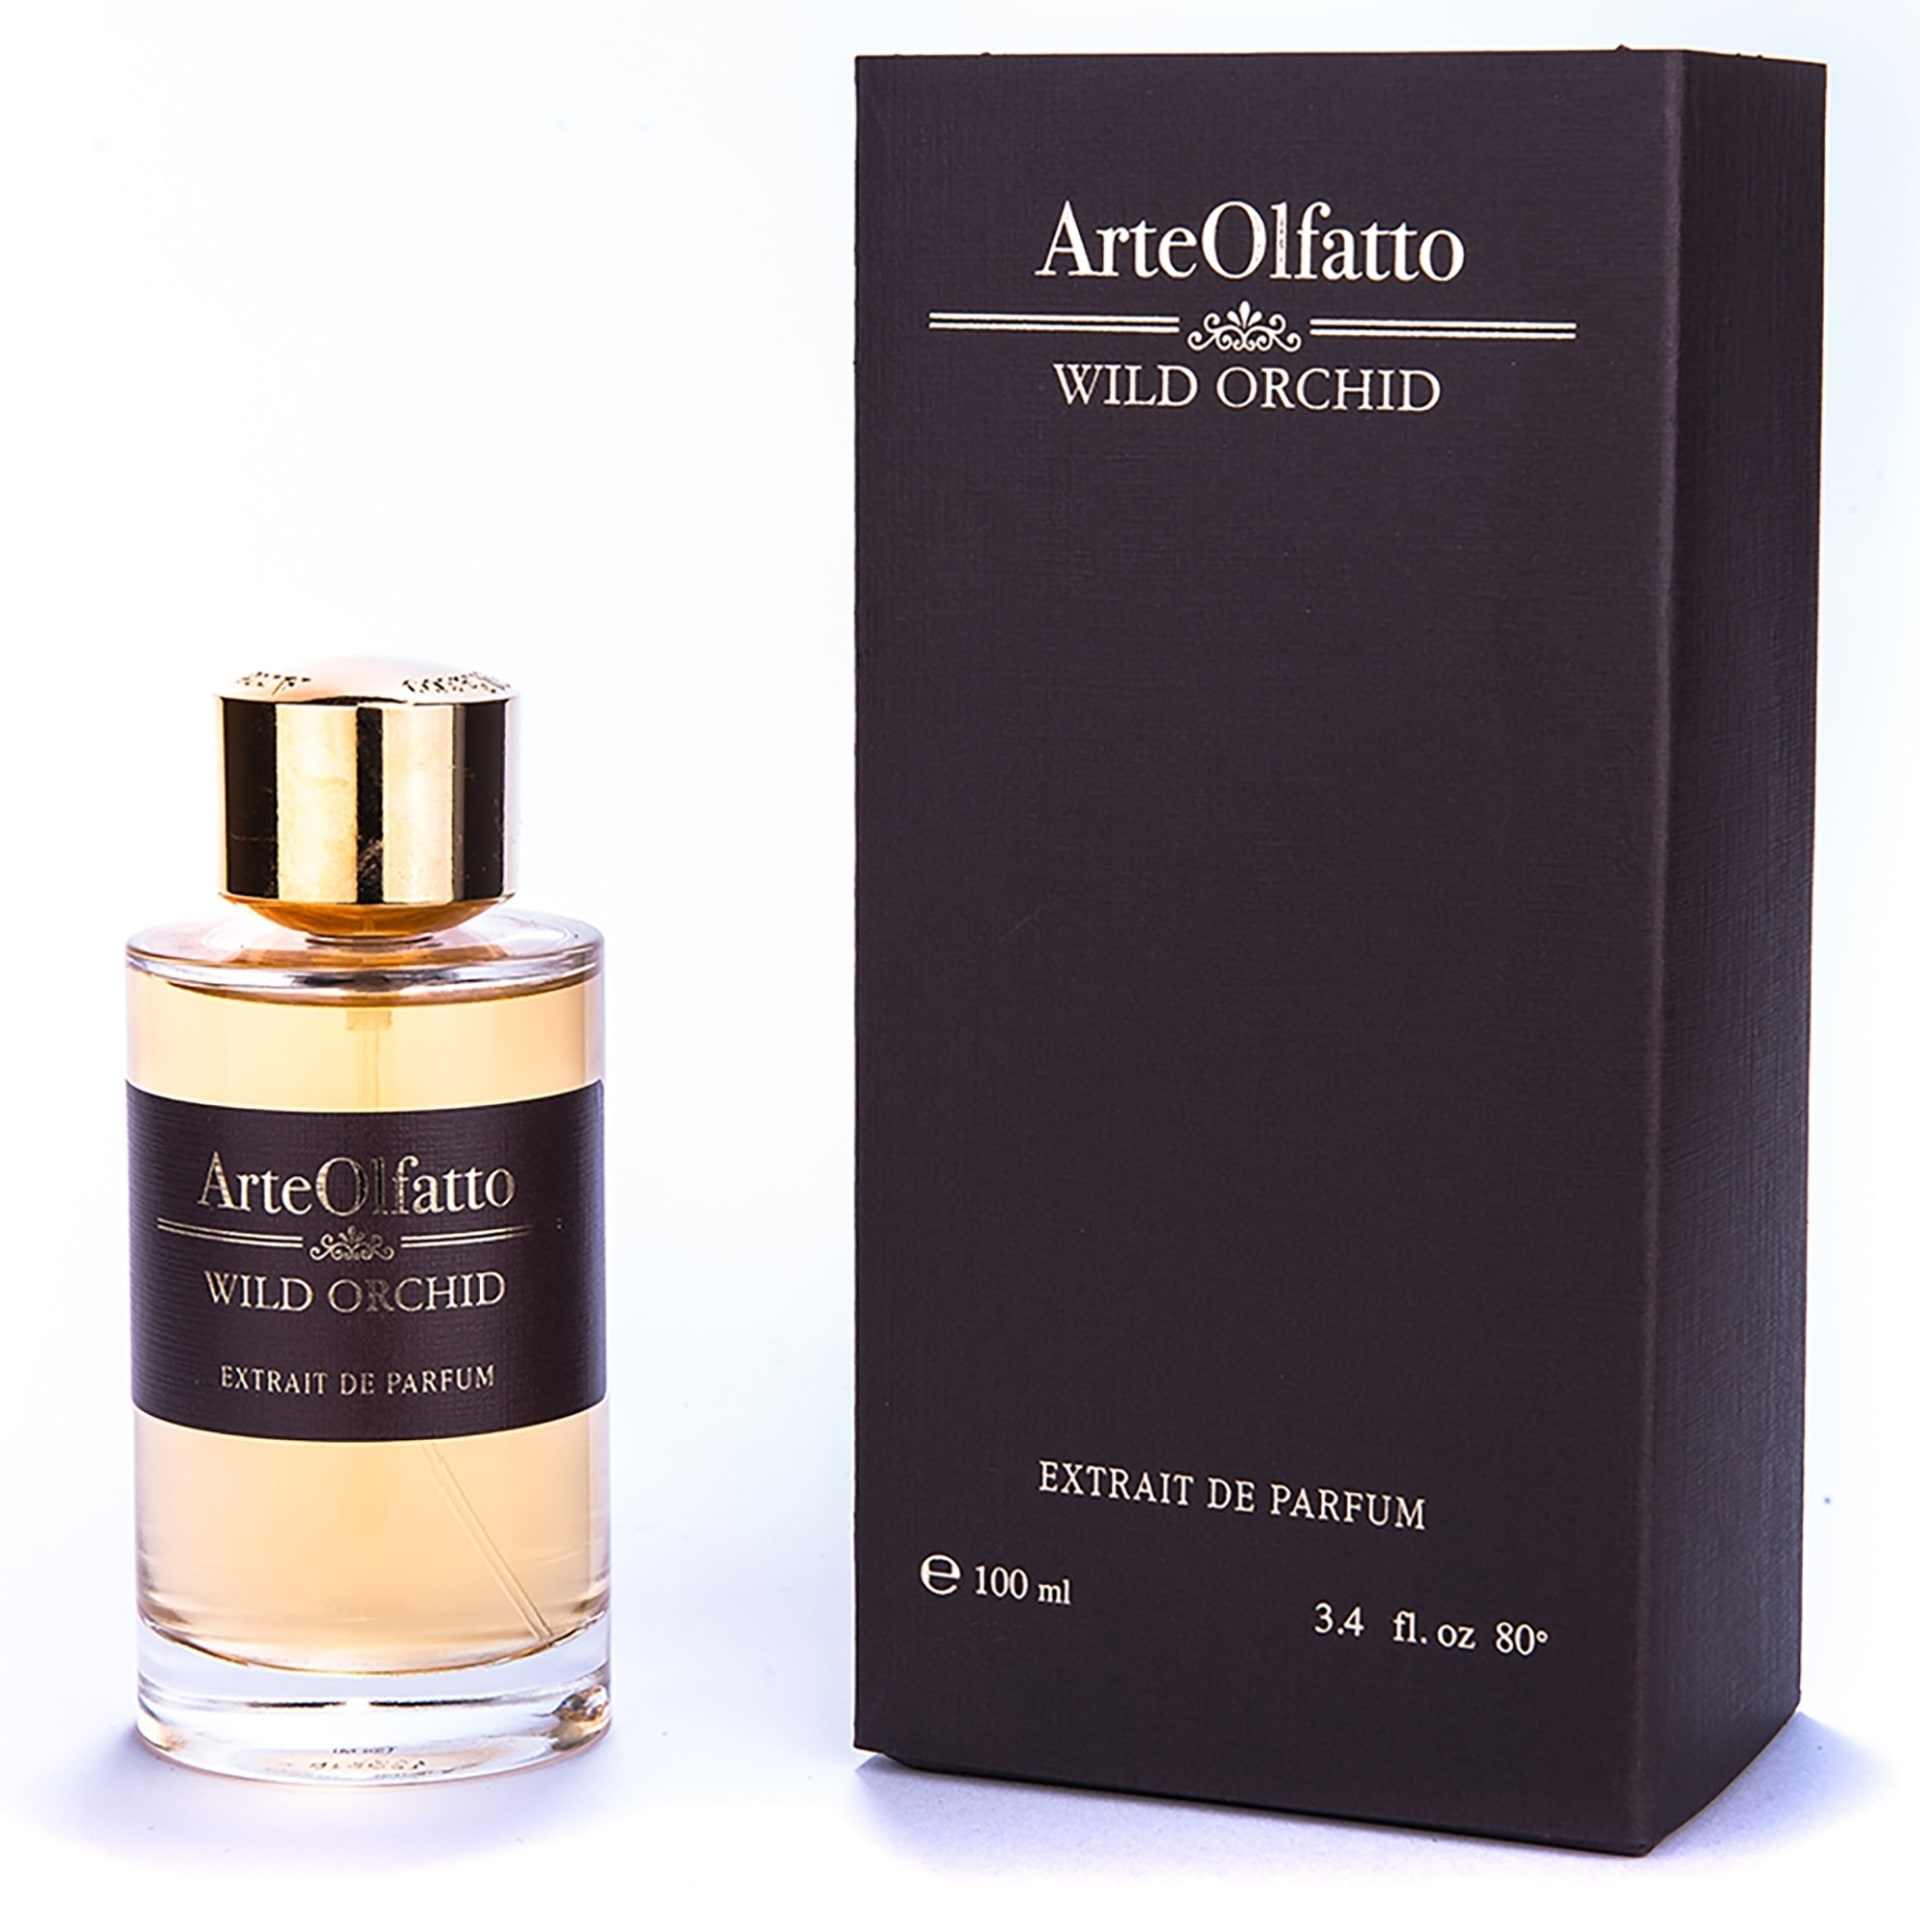 arteolfatto-wild-orchid-2